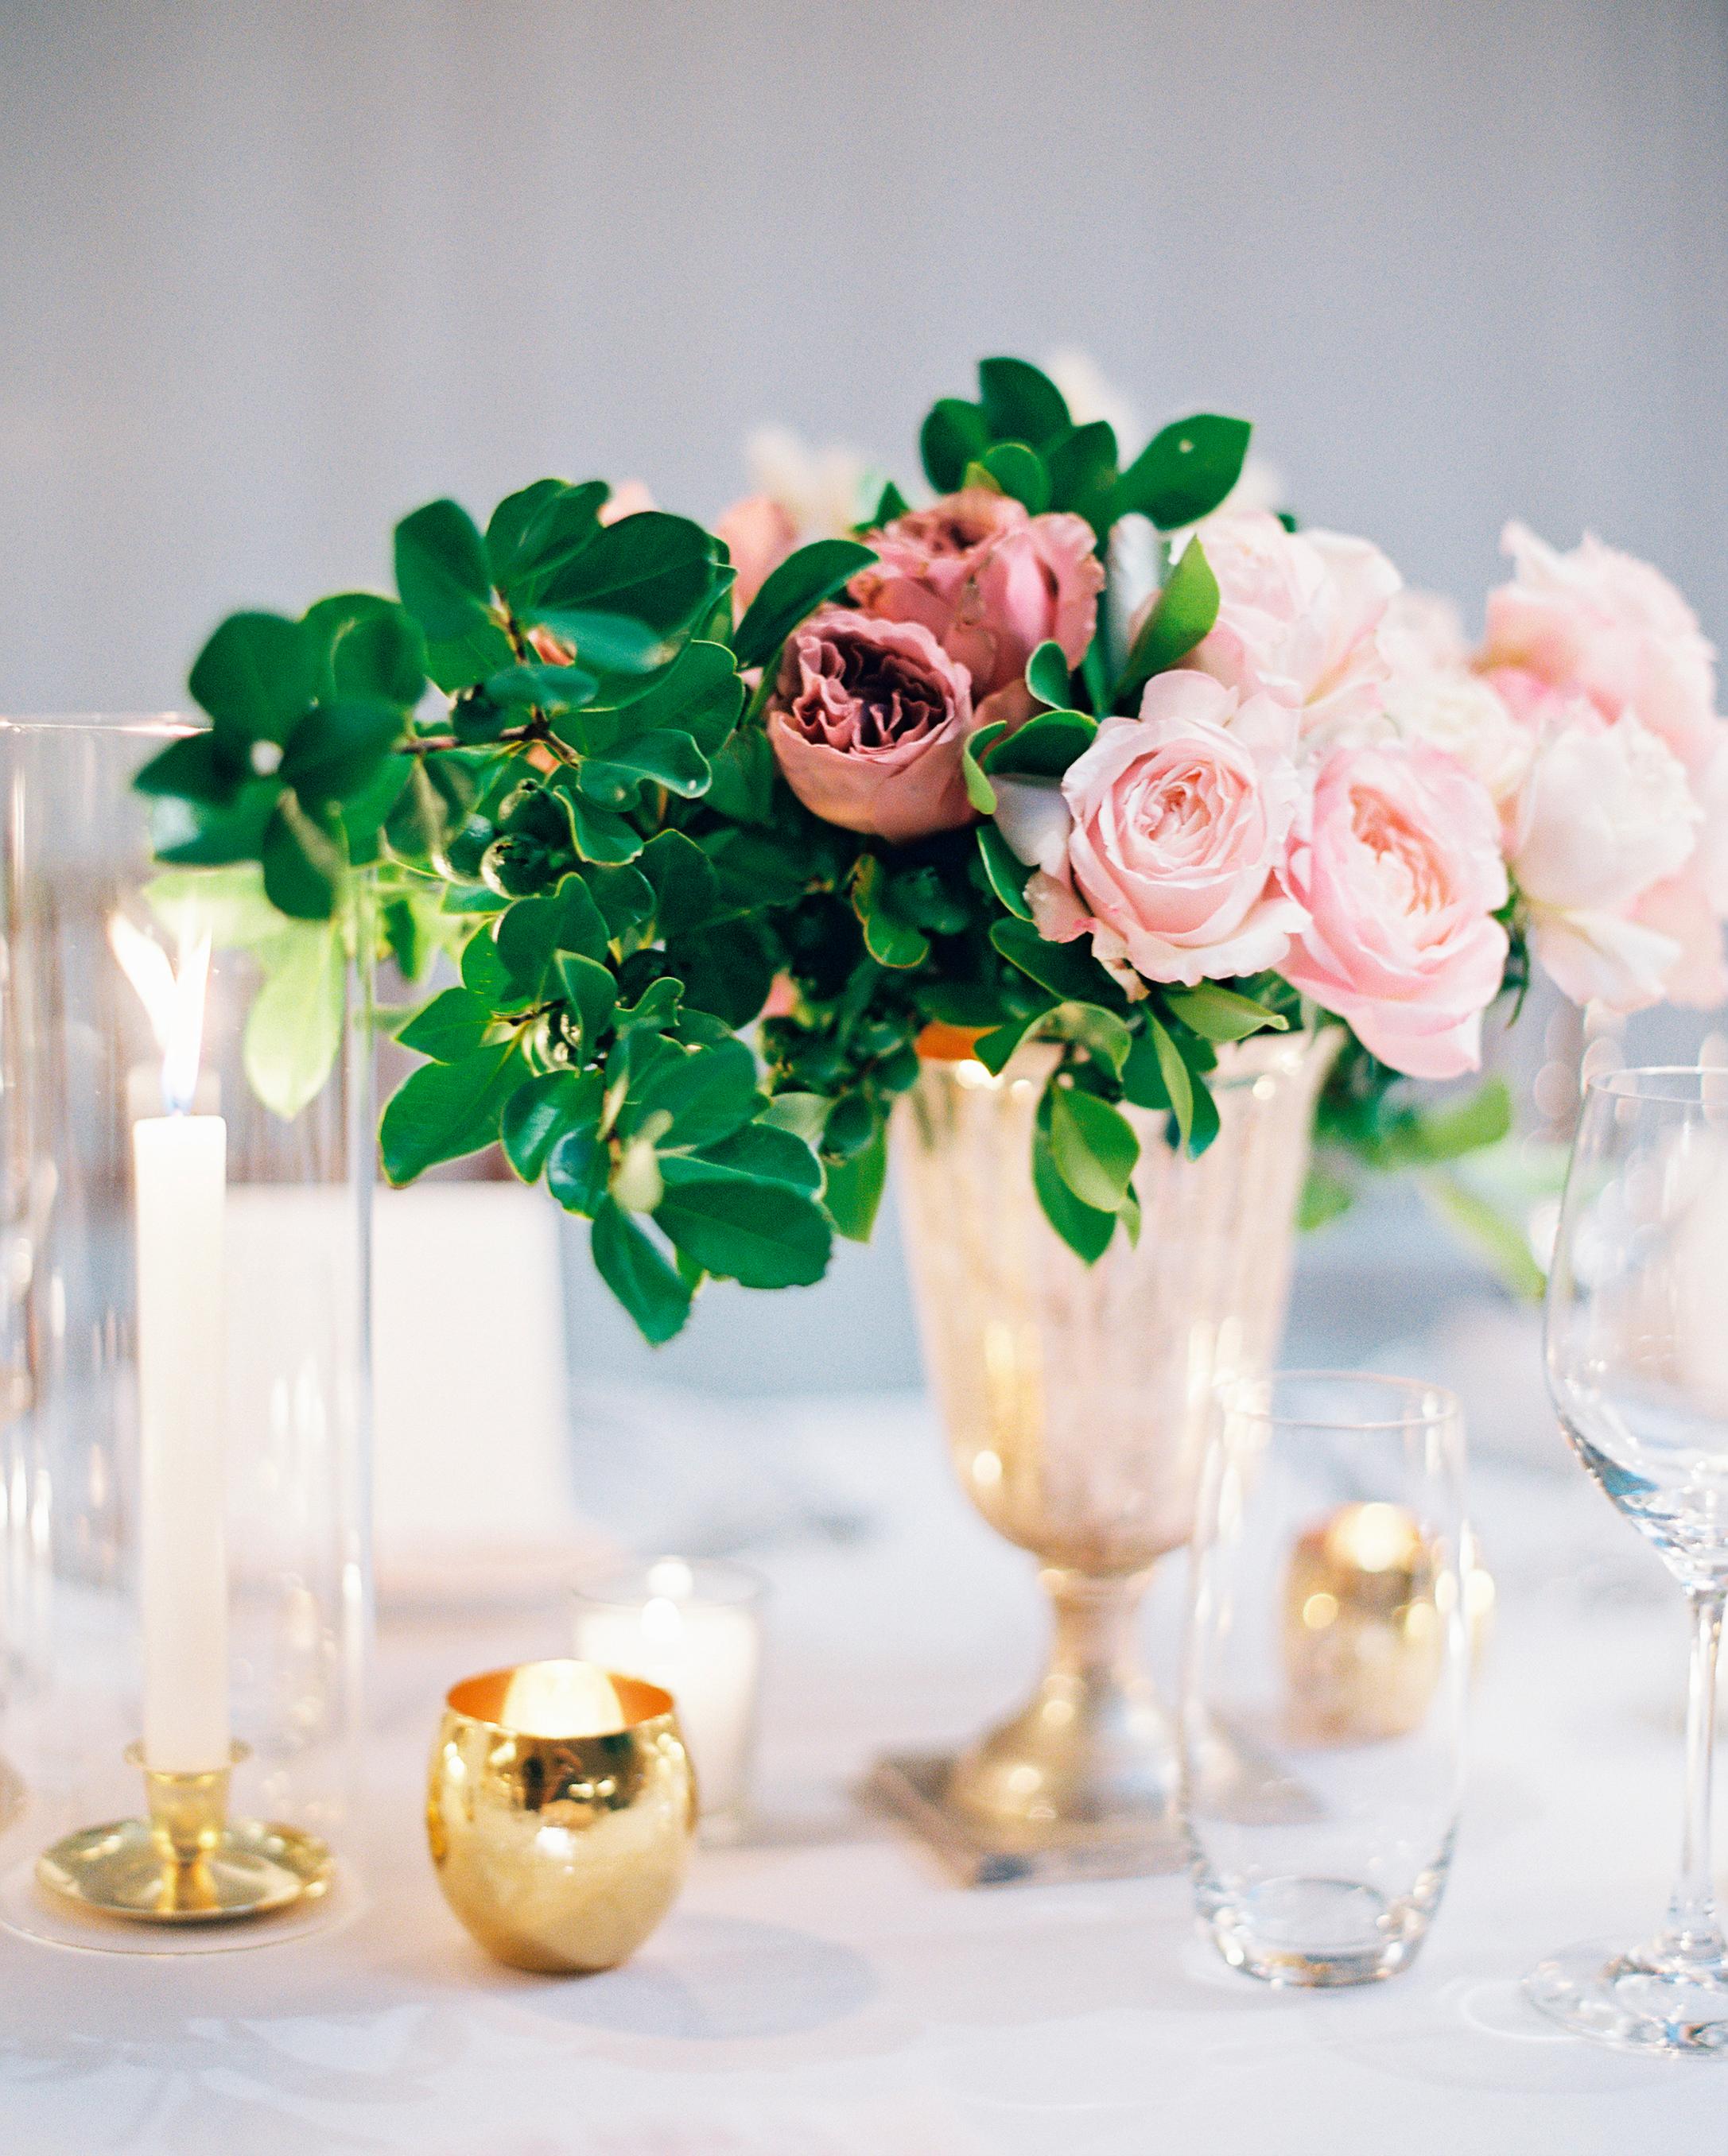 jemma-michael-wedding-centerpieces-002600015-s112110-0815.jpg